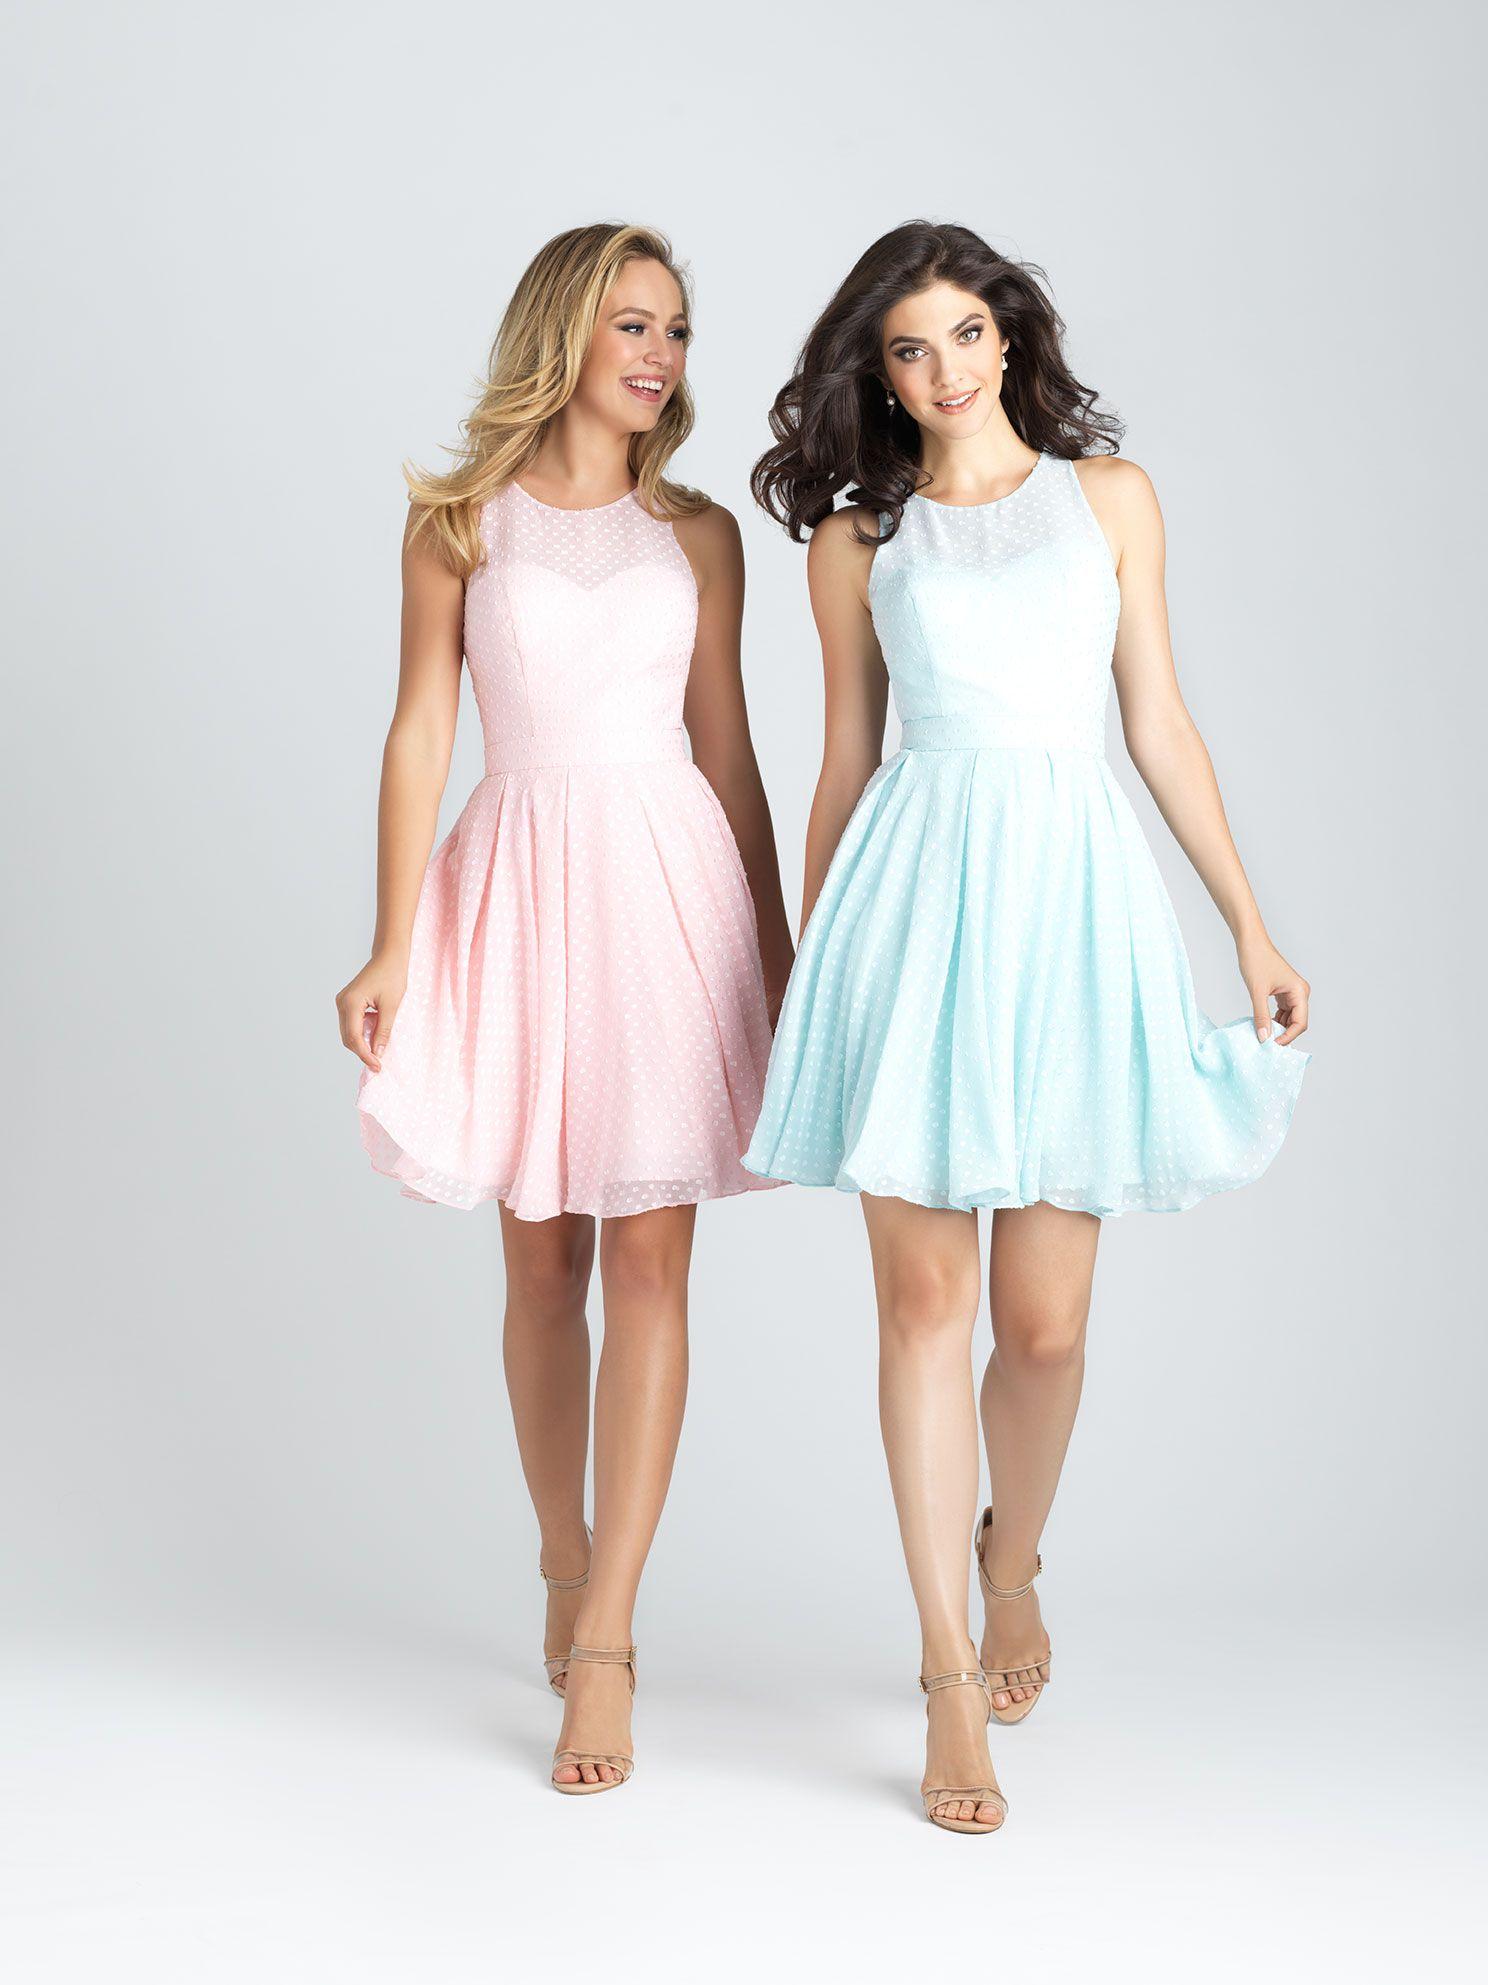 Allure Bridesmaid Dress - Style: 1541 | Wedding: Bridesmaids Dresses ...